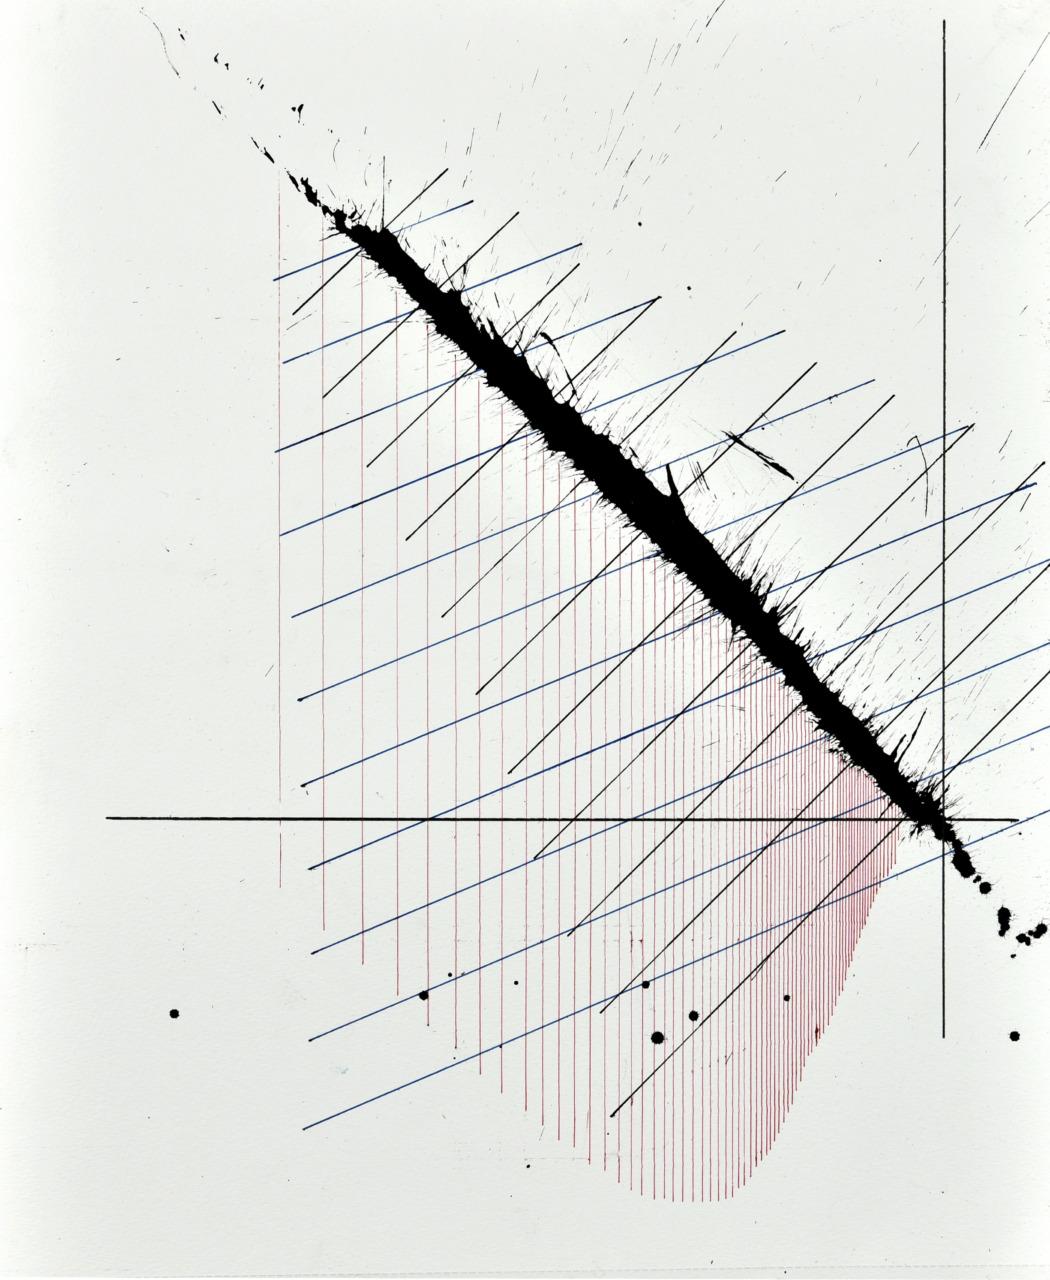 Op250520. Acrylic on paper, 37x46cm